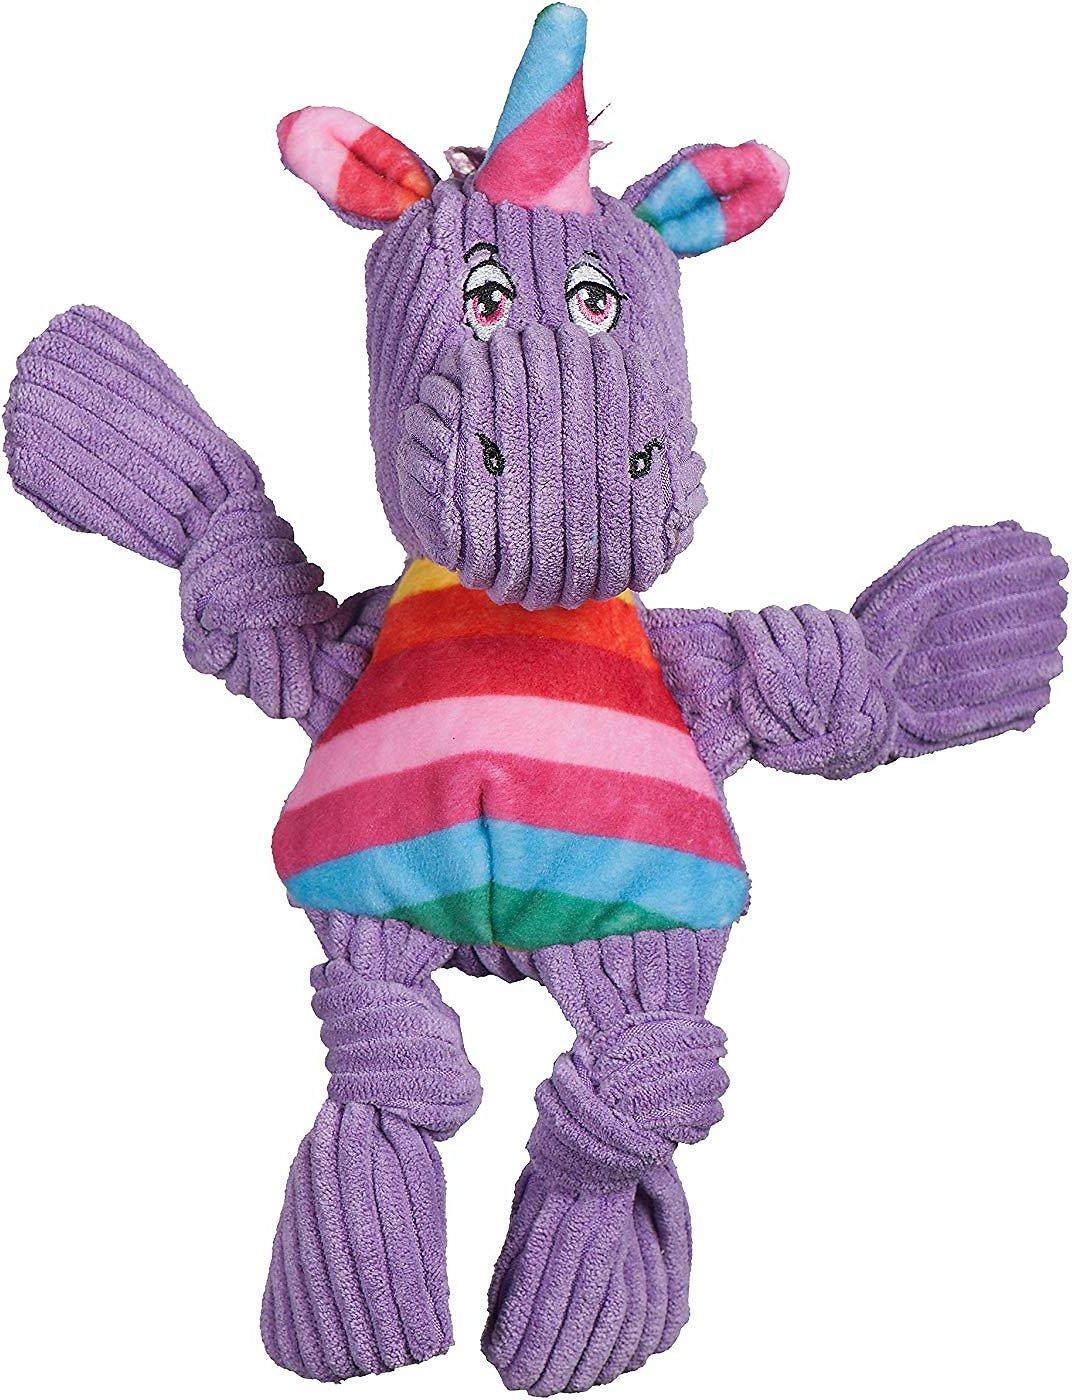 HuggleHounds Knottie Rainbow Unicorn Dog Toy, Small